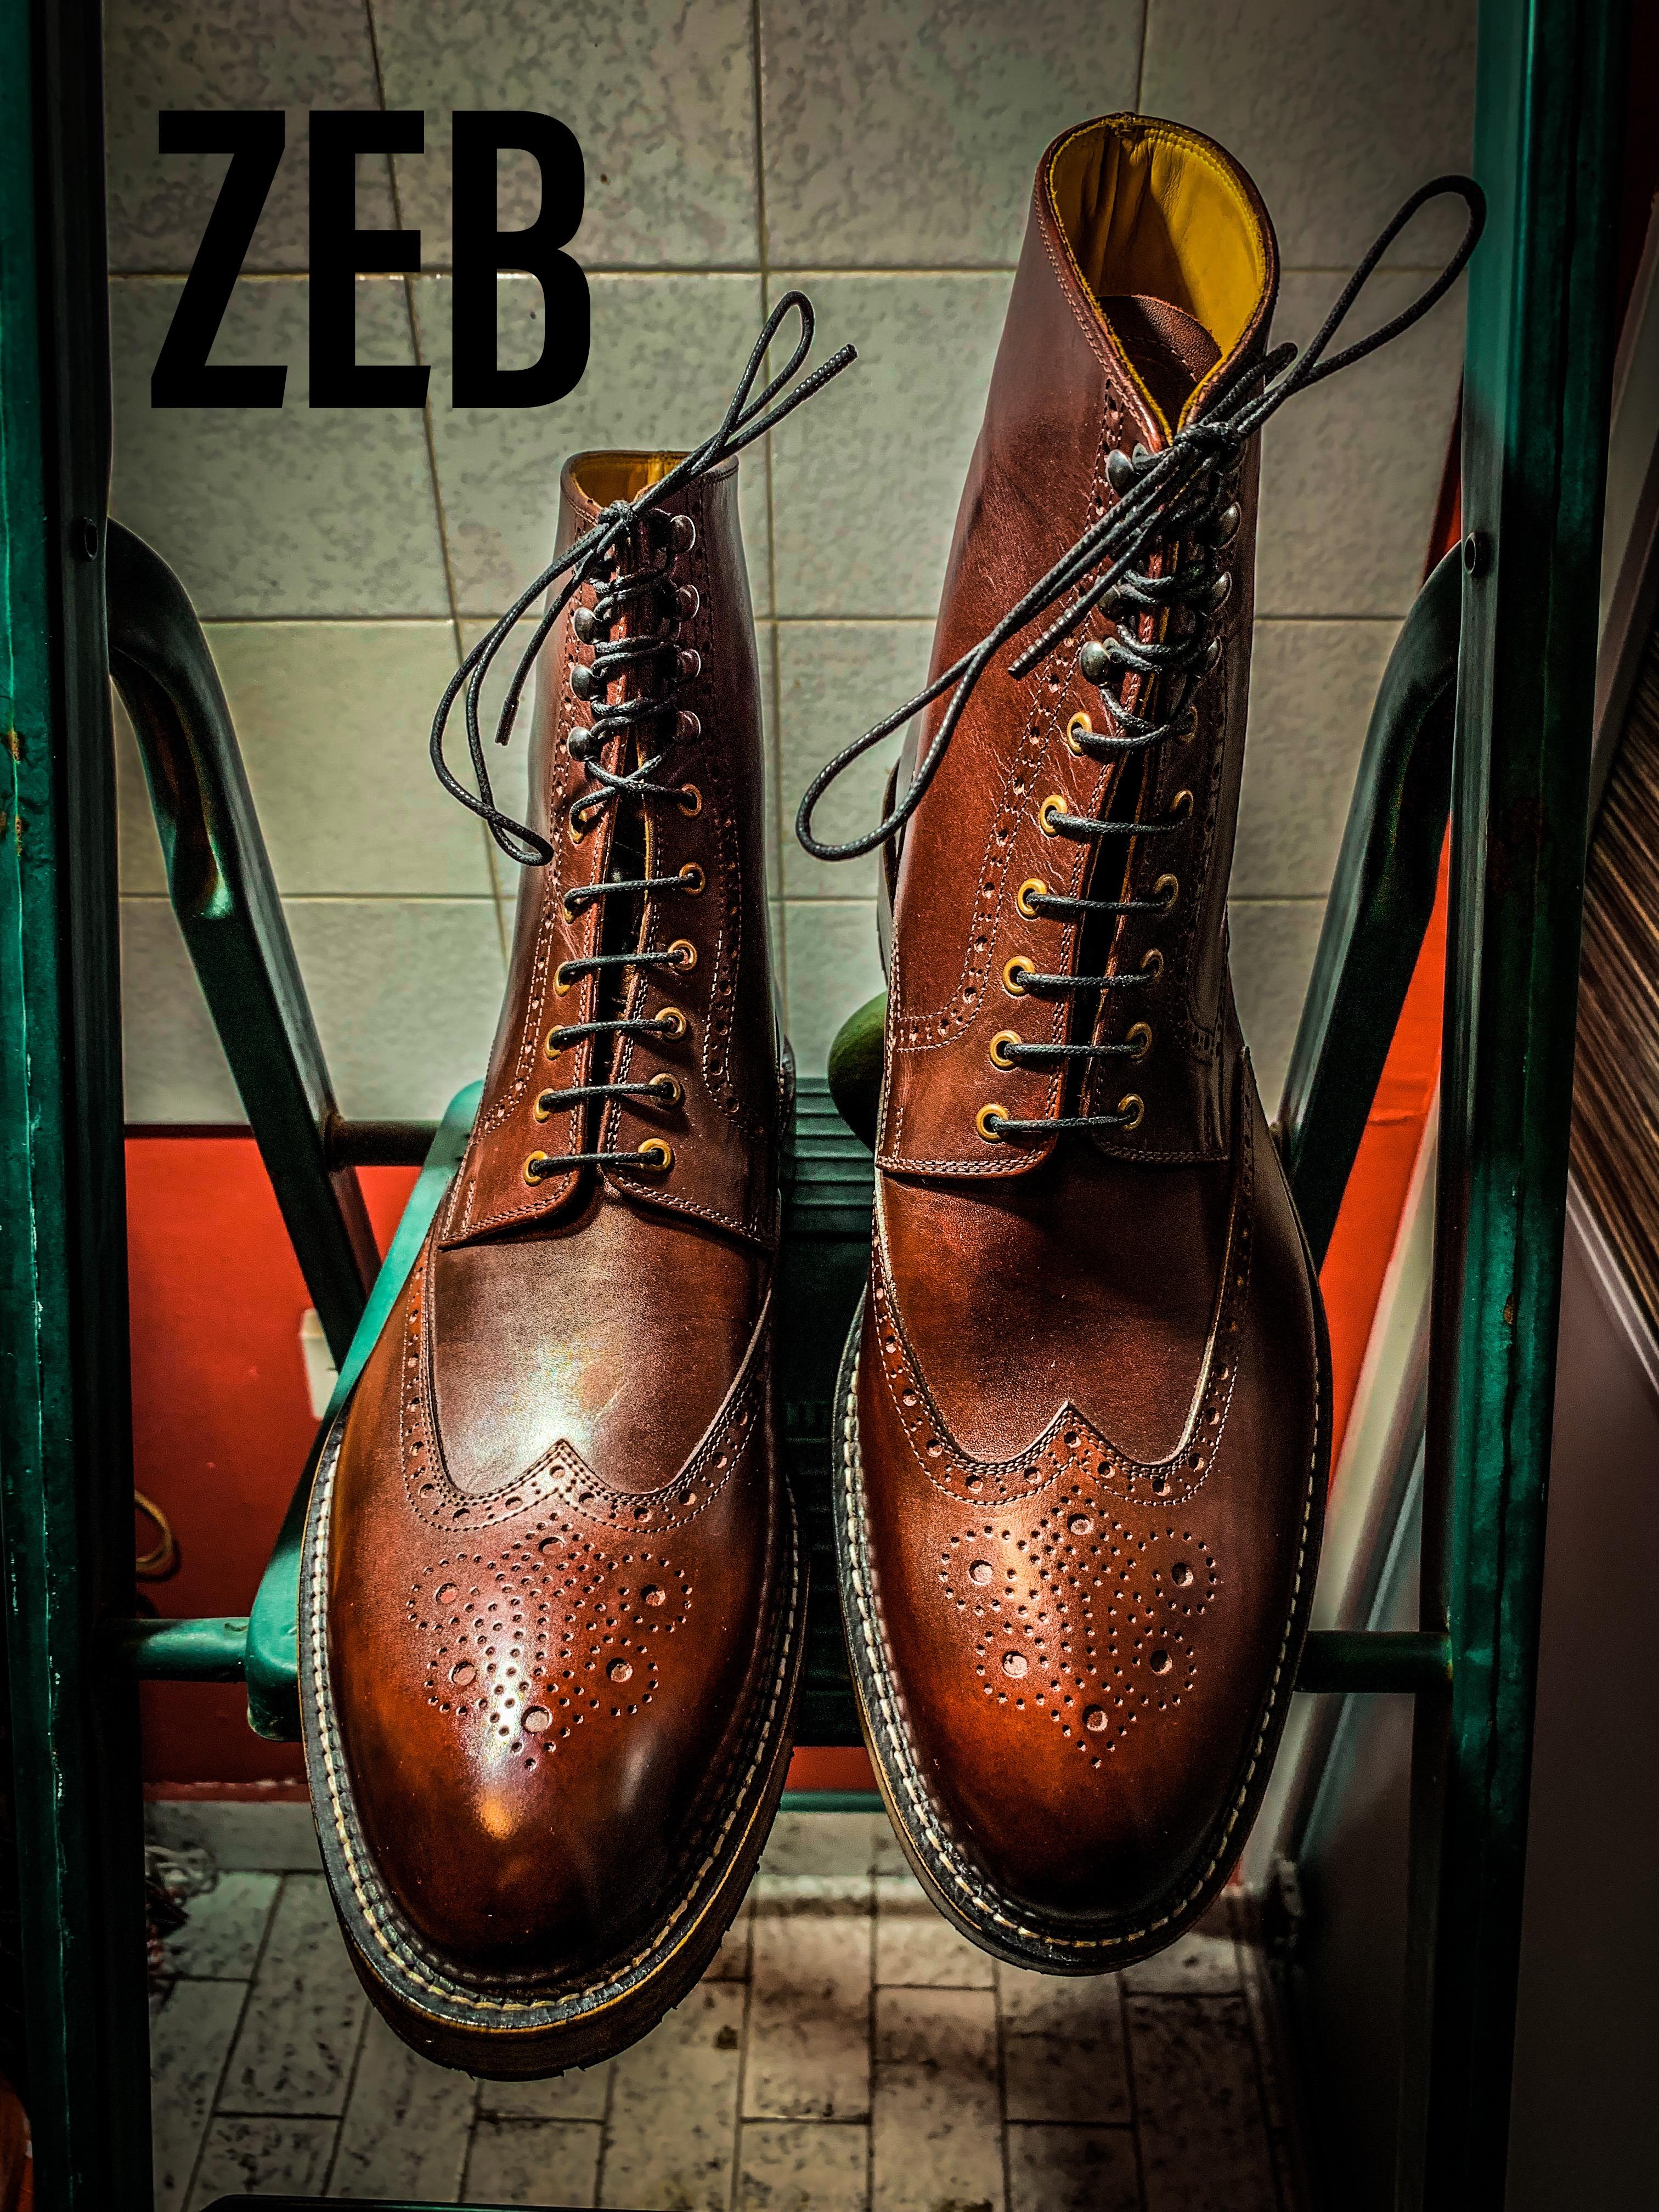 Leather-Boots-Giau-Burgundy-Gal4